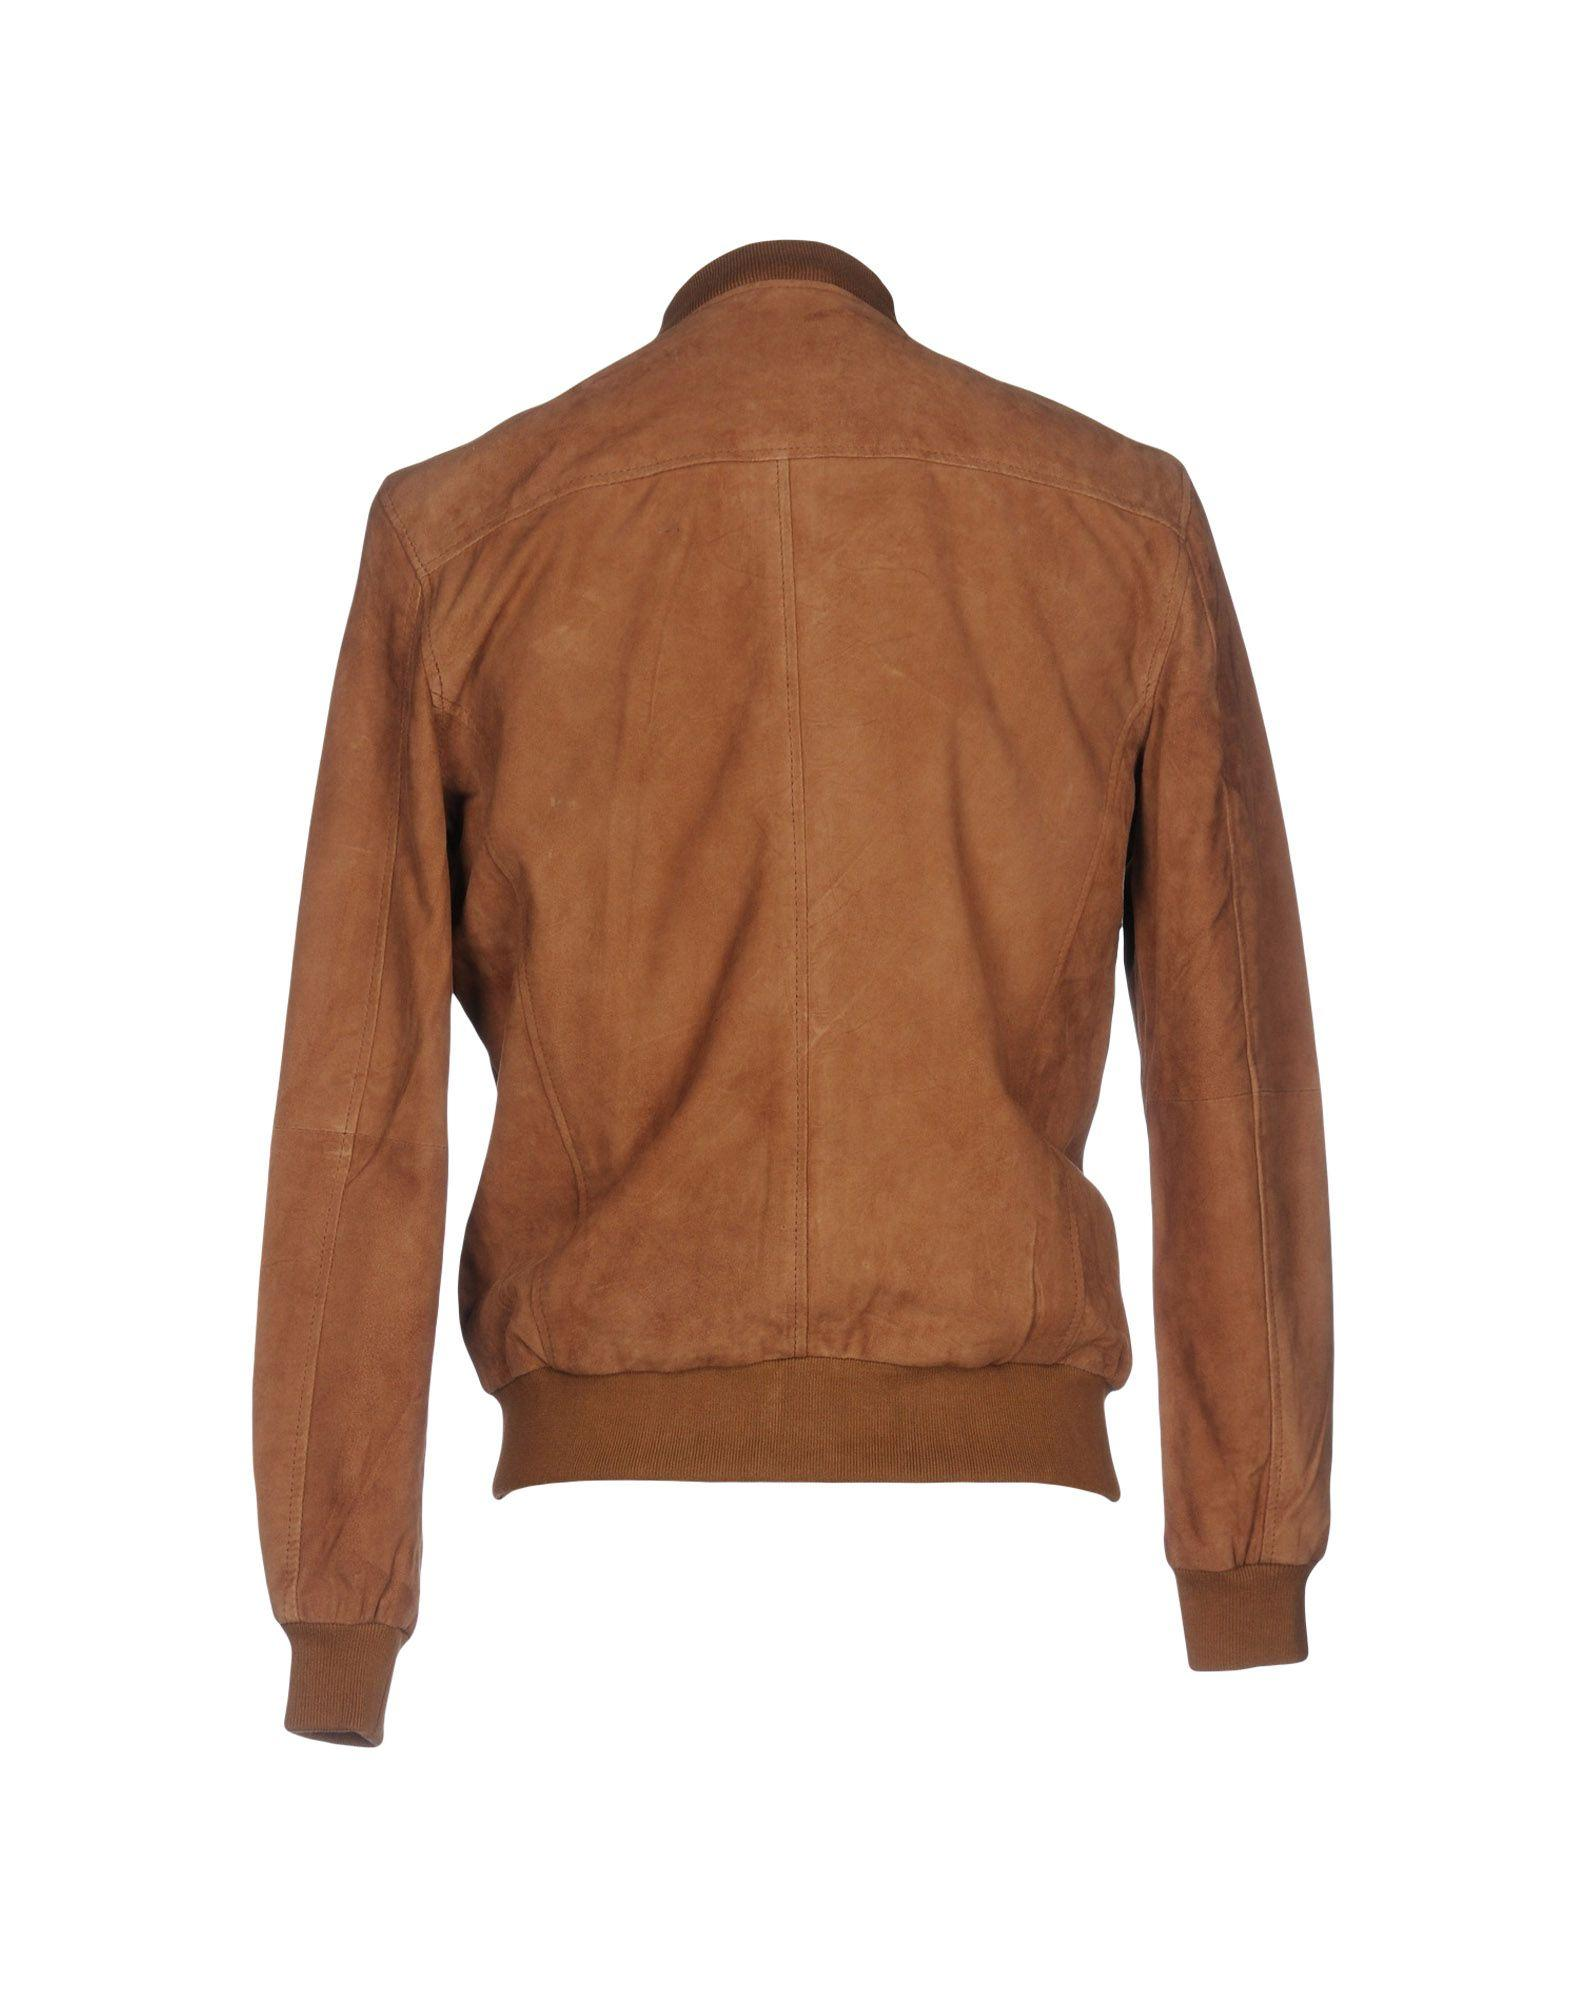 Originals By Jack & Jones Leather Jacket in Camel (Brown) for Men